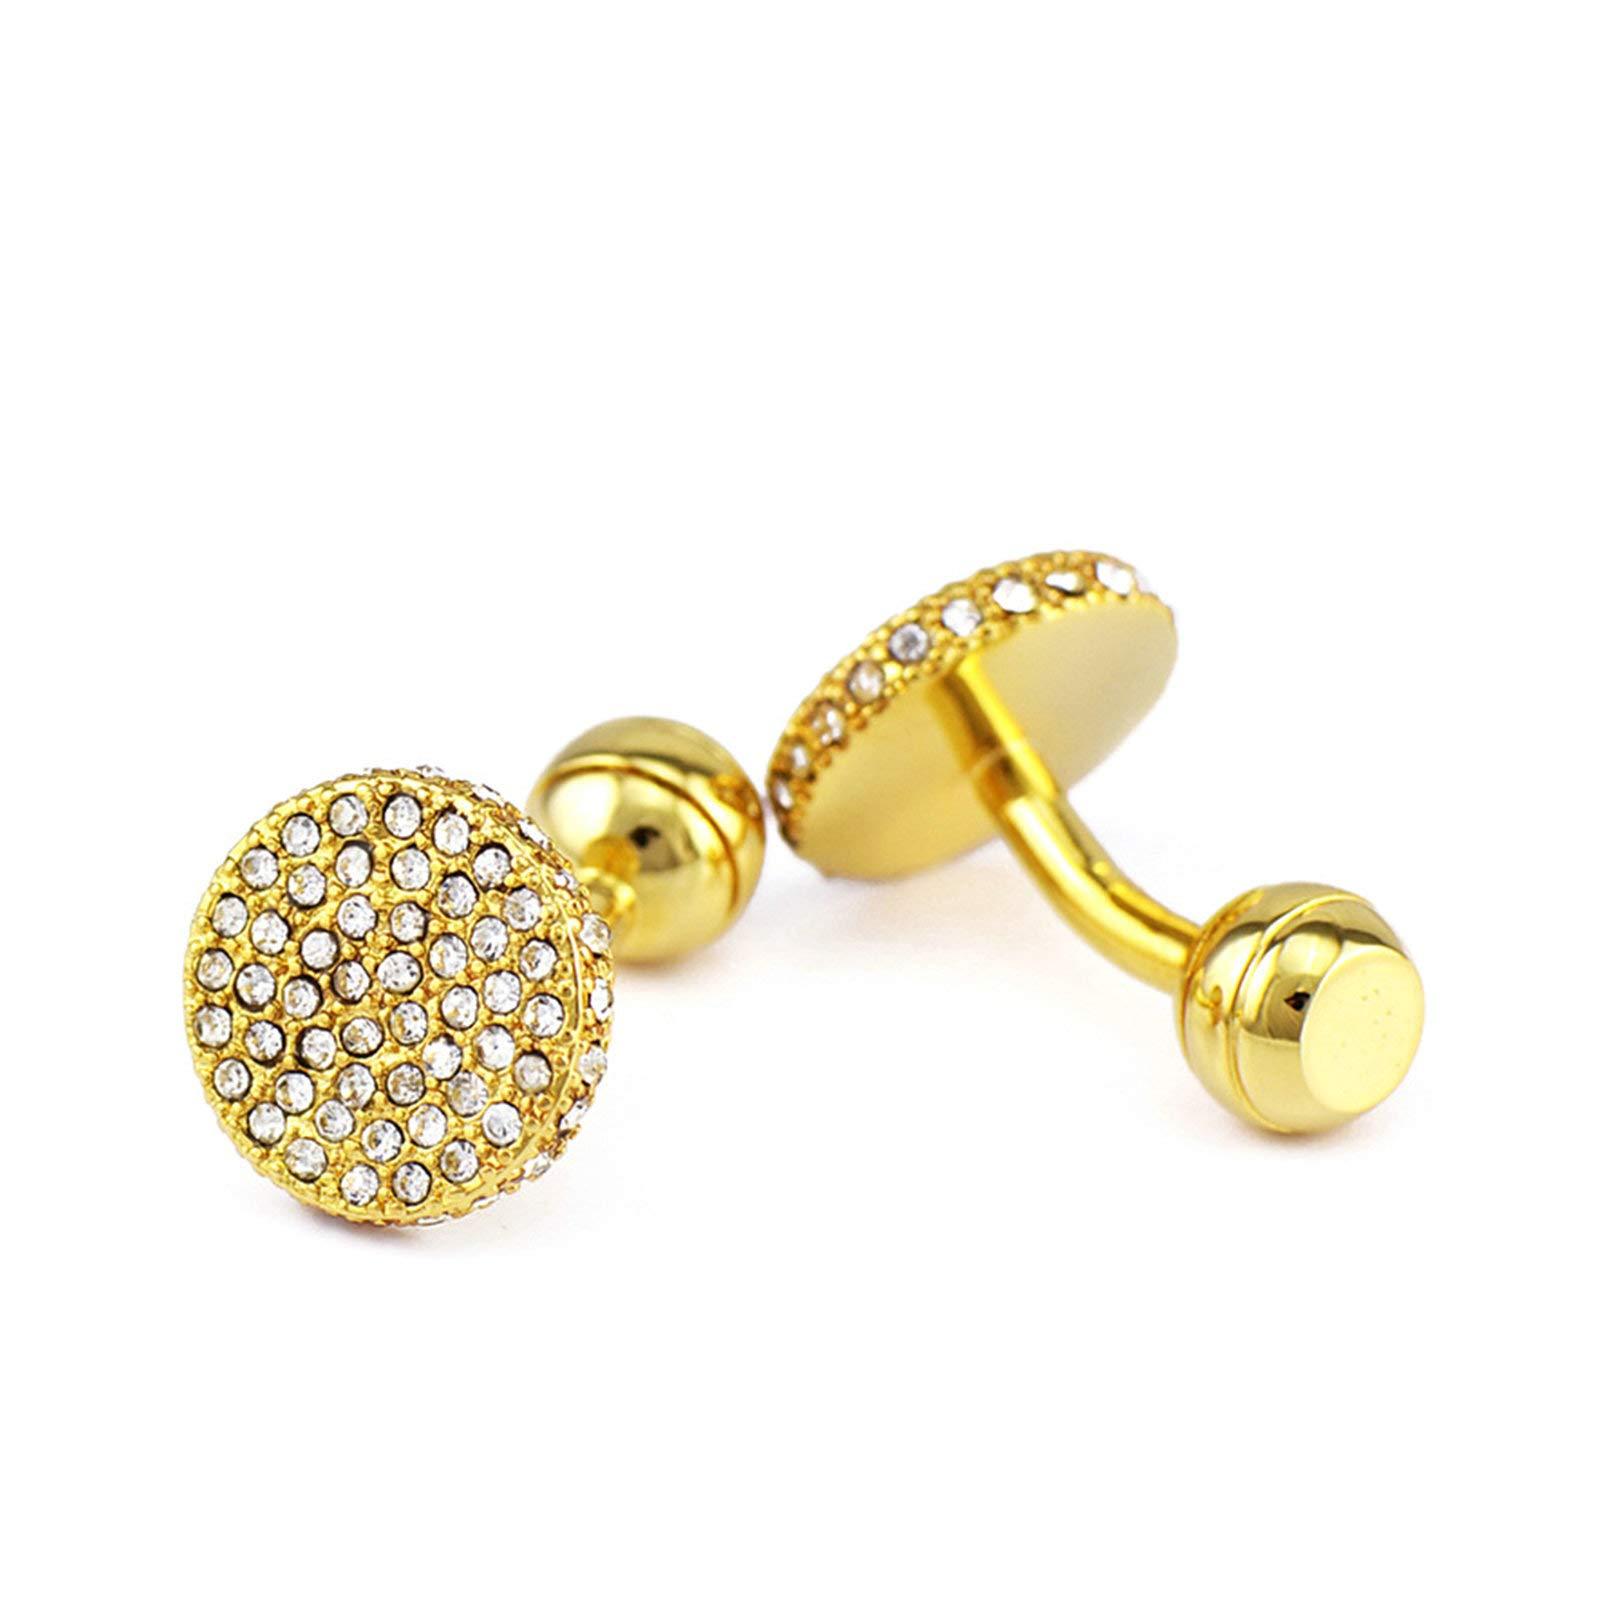 EoCot Shirt Cuff Links Wedding Cufflinks Copper Gold Round Cubic Zirconia Business Wedding Party Jewelry Gift